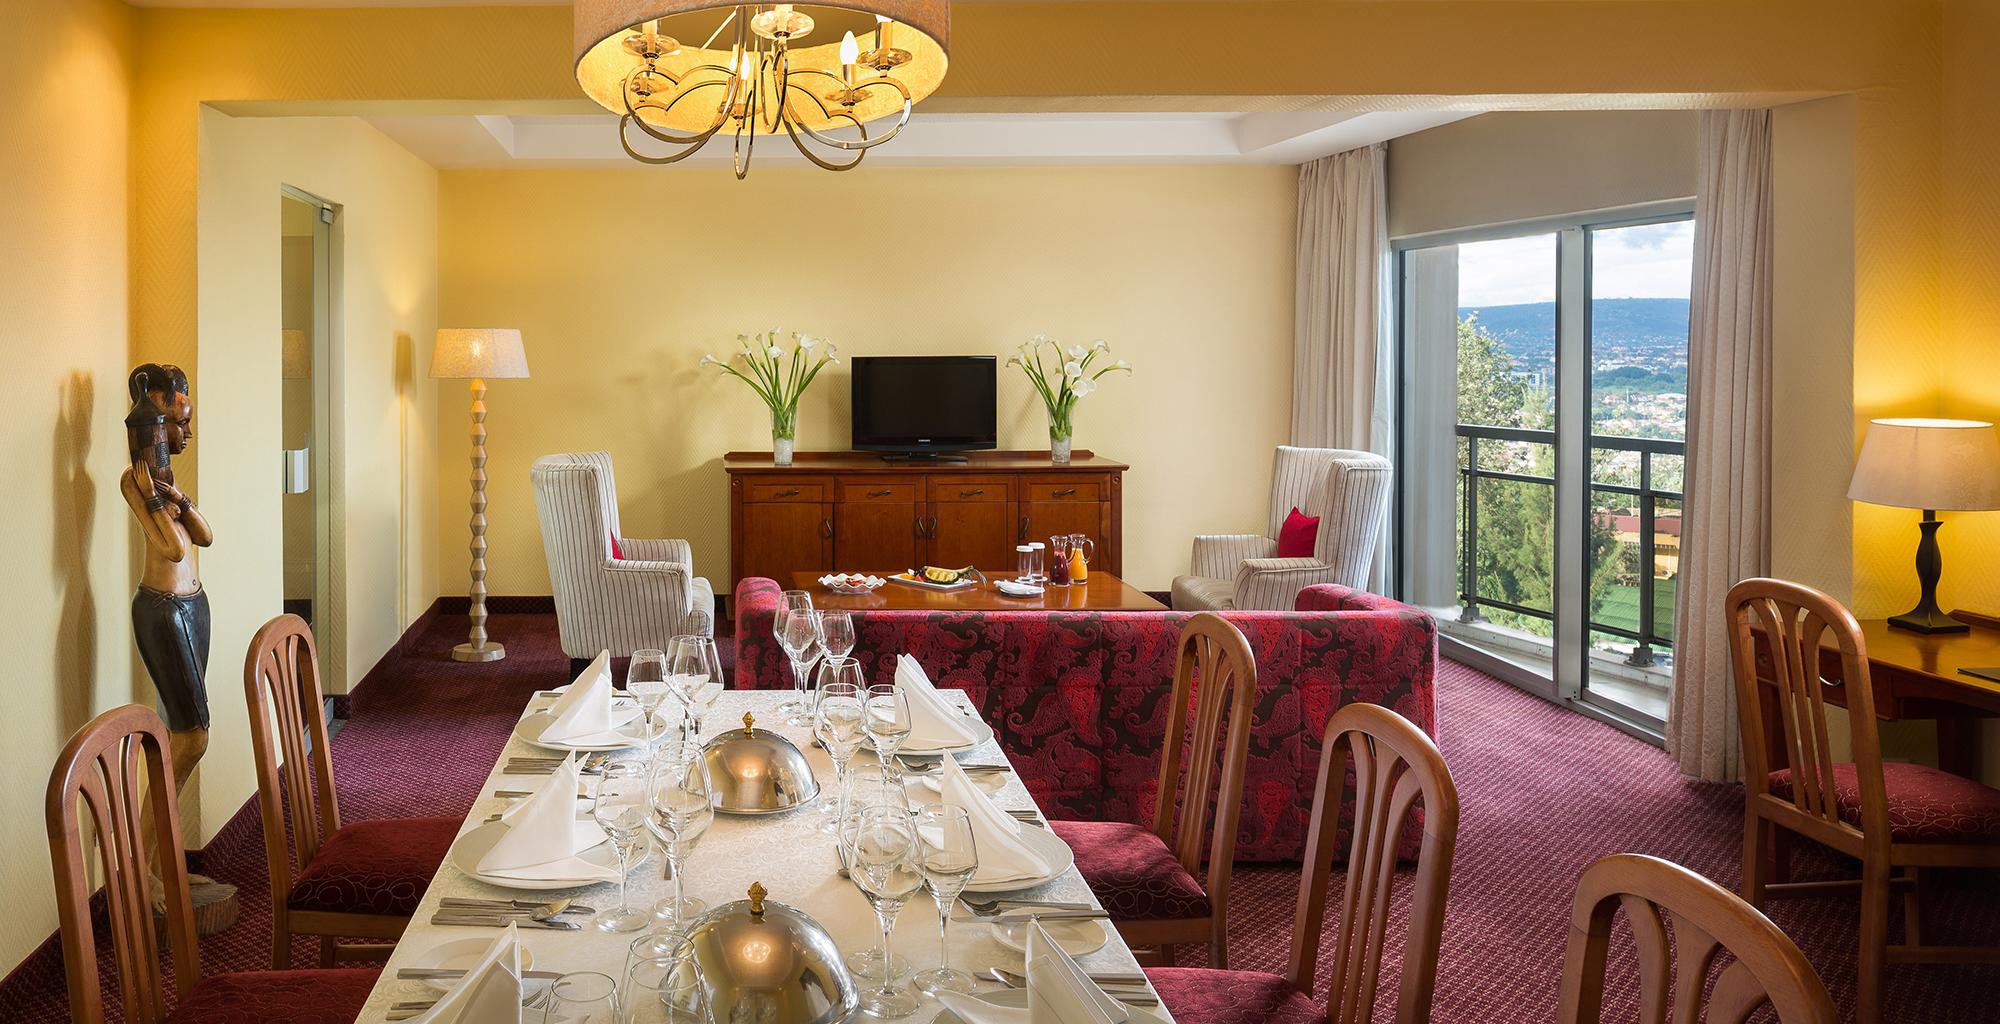 Rwanda-Hotel-Mille-Collines-Dining